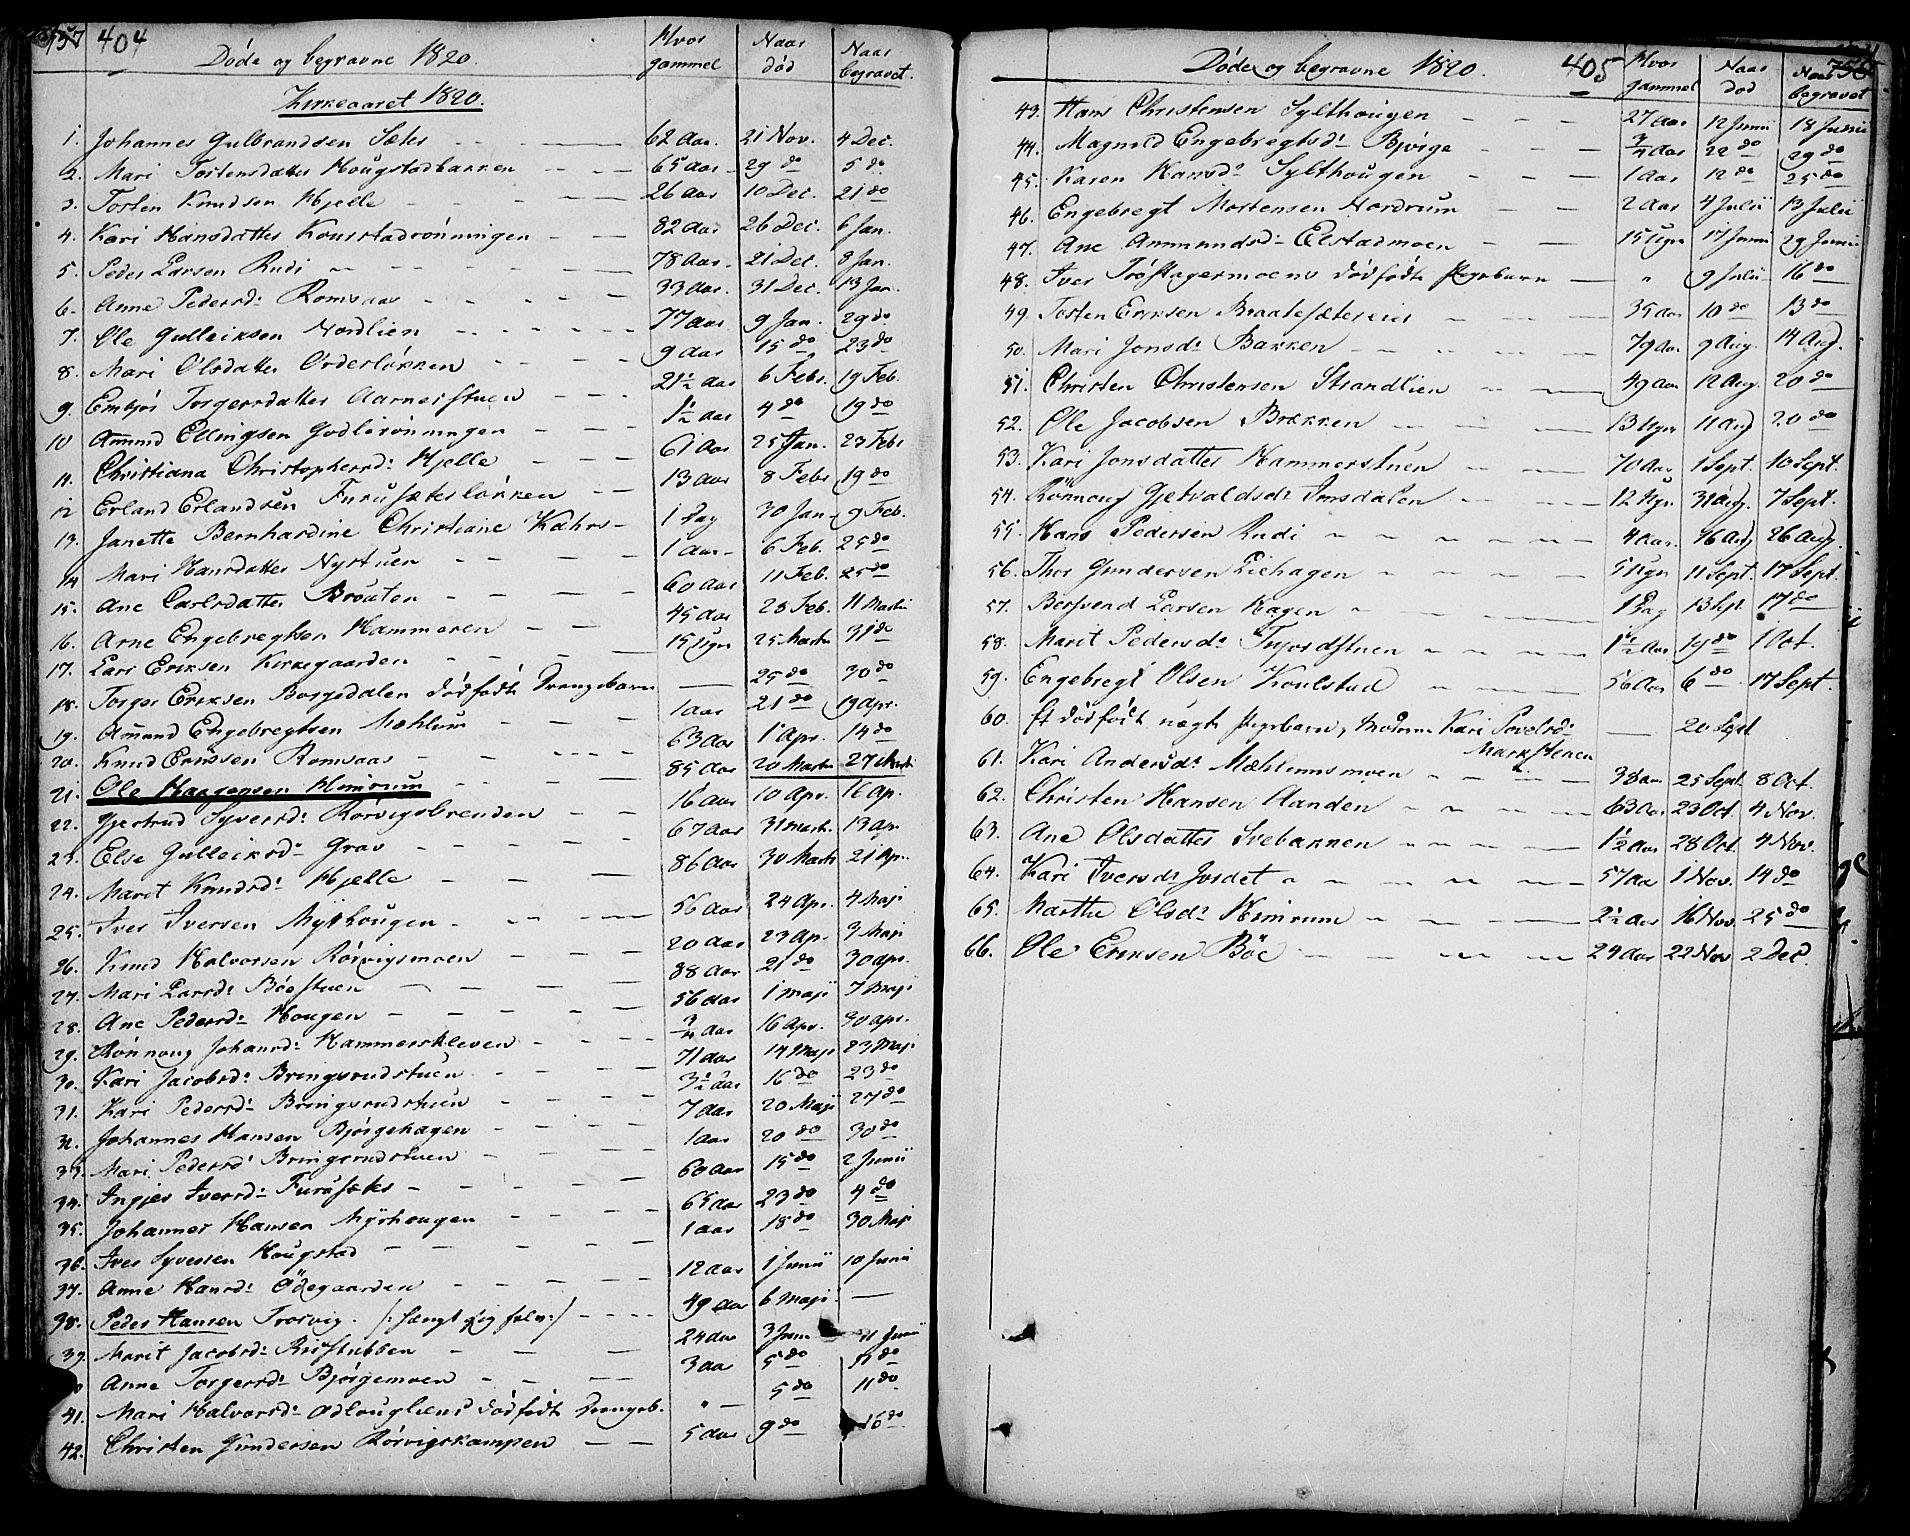 SAH, Ringebu prestekontor, Ministerialbok nr. 3, 1781-1820, s. 404-405